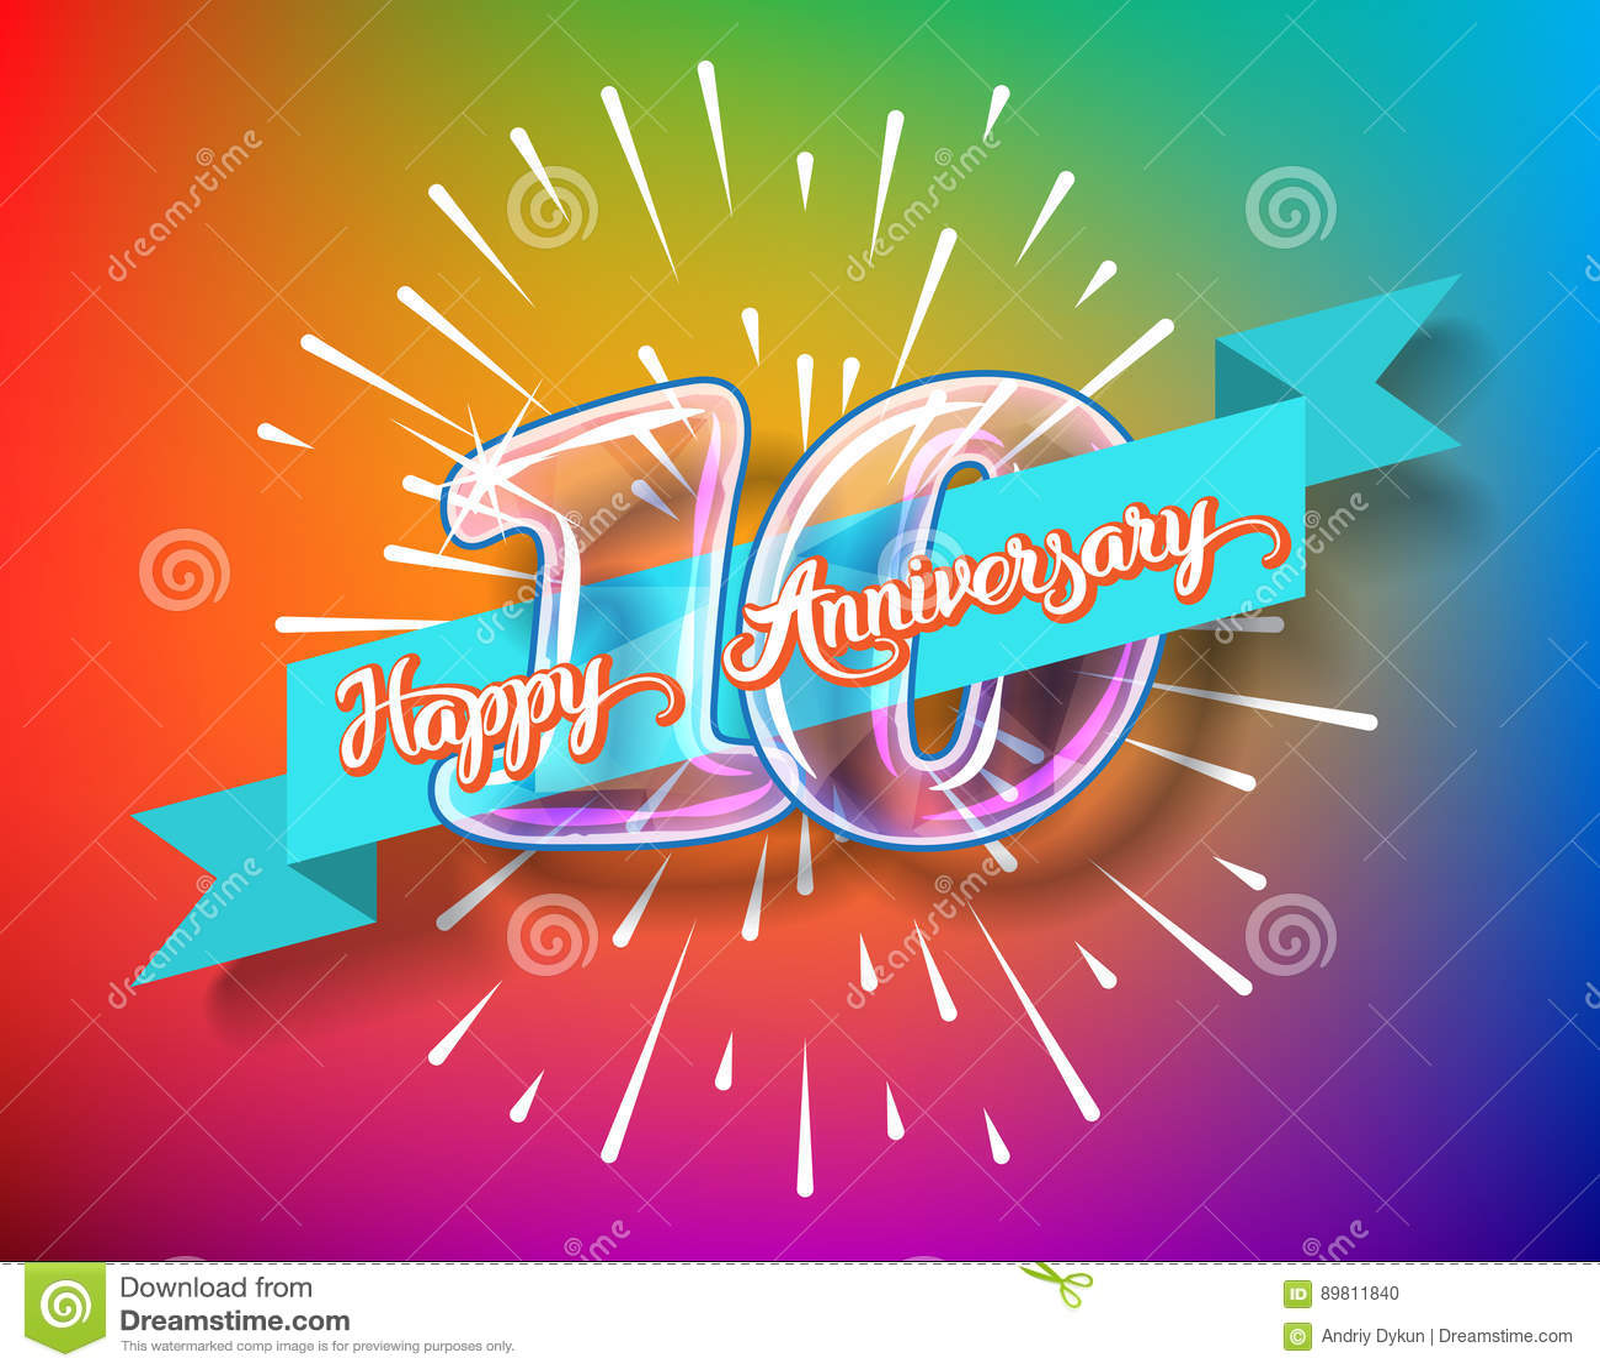 Happy 10th Anniversary Www Pixshark Com Images